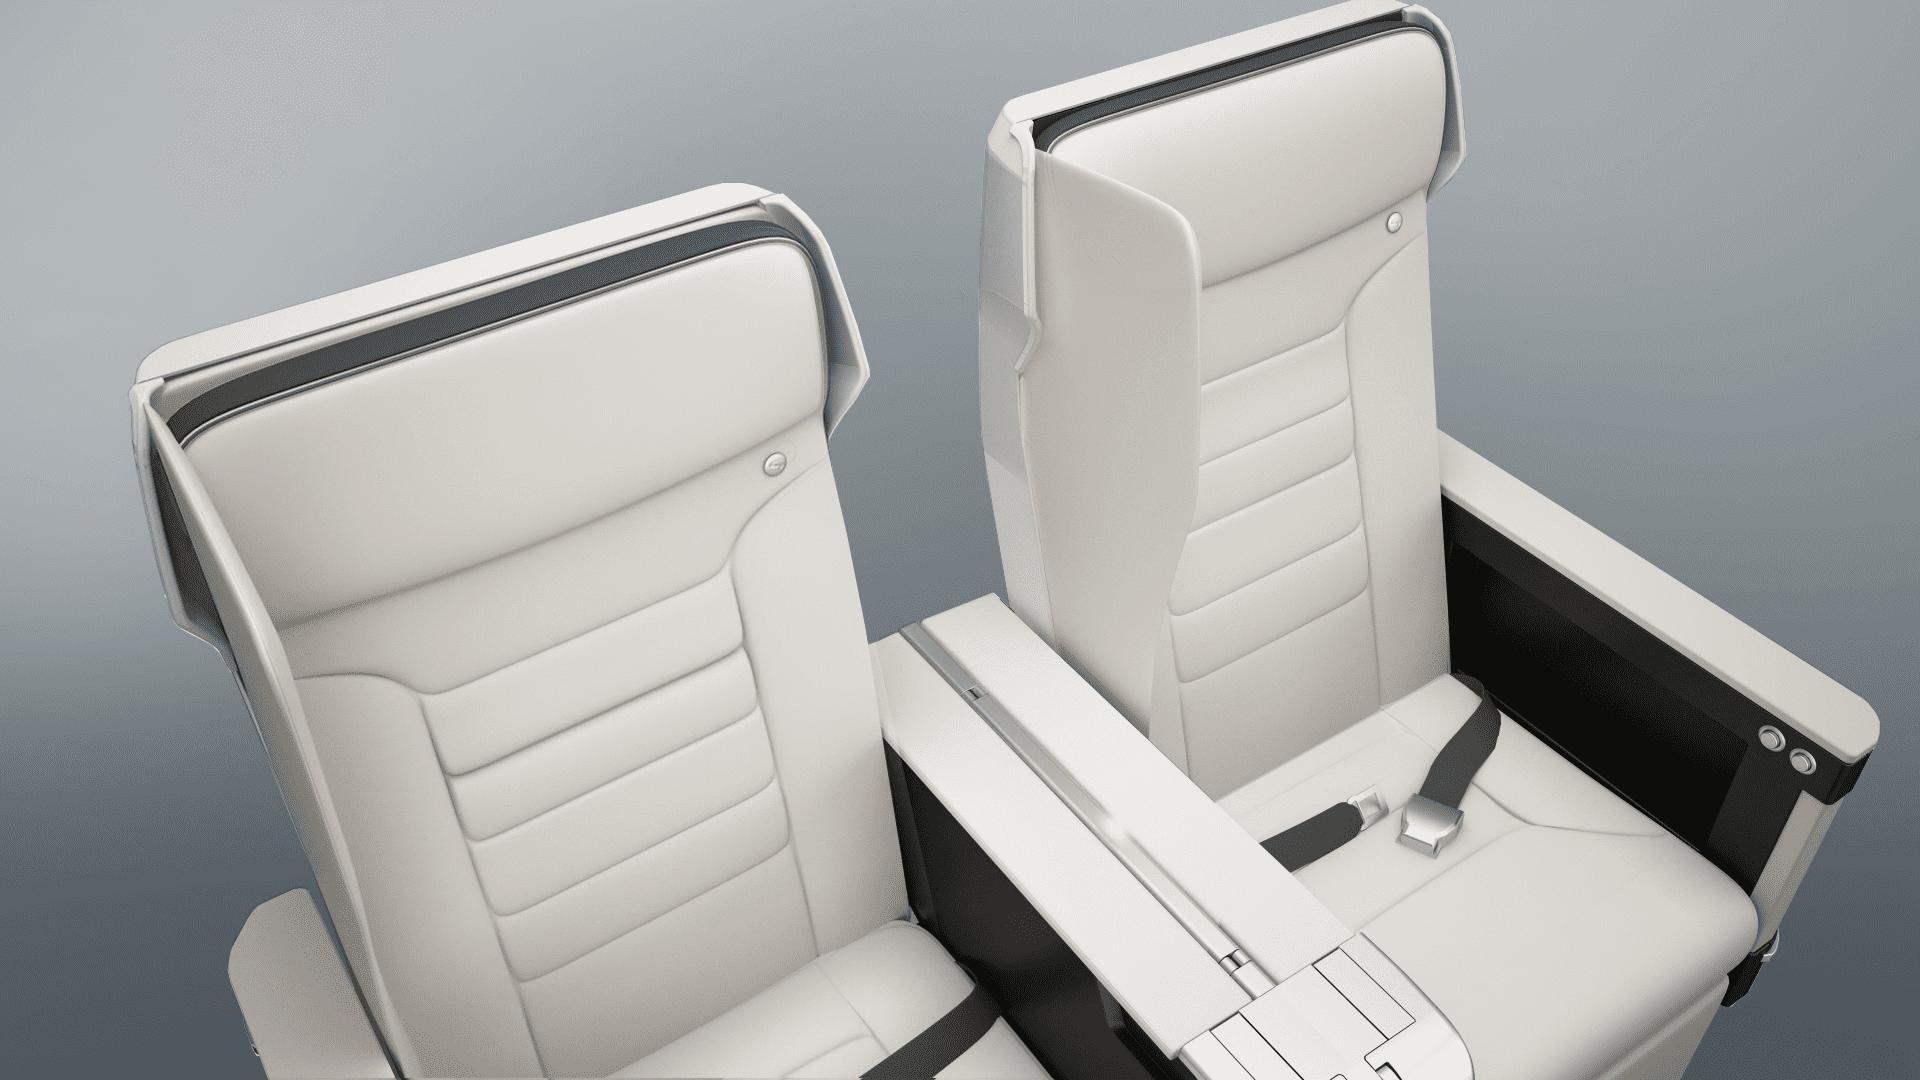 Interspace de Safran Seats